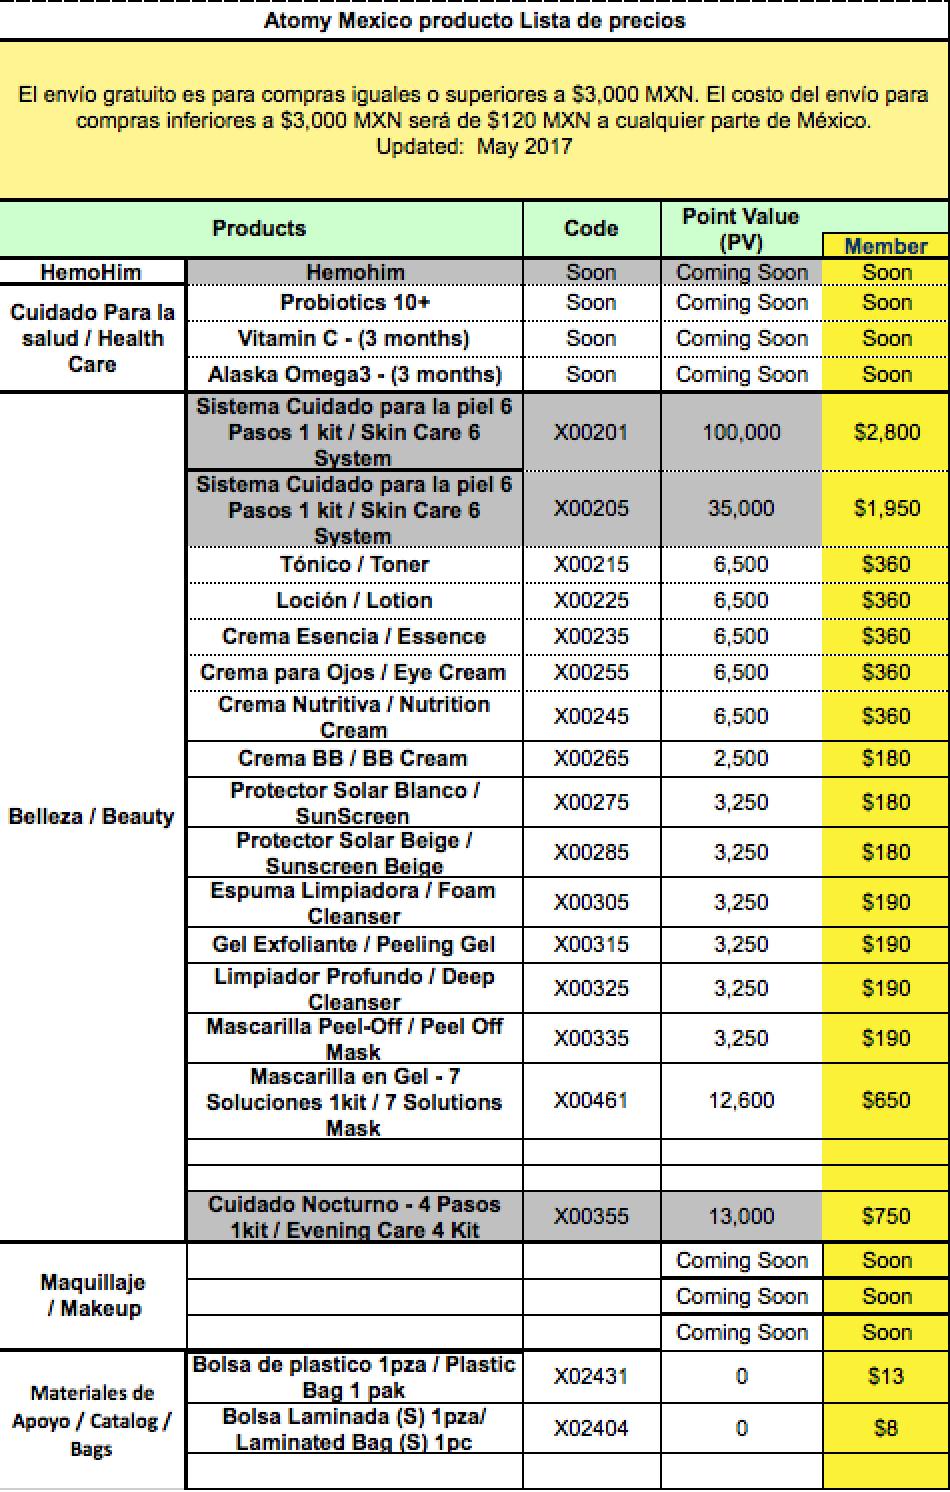 Atomy Mexico Price List Atomysmart